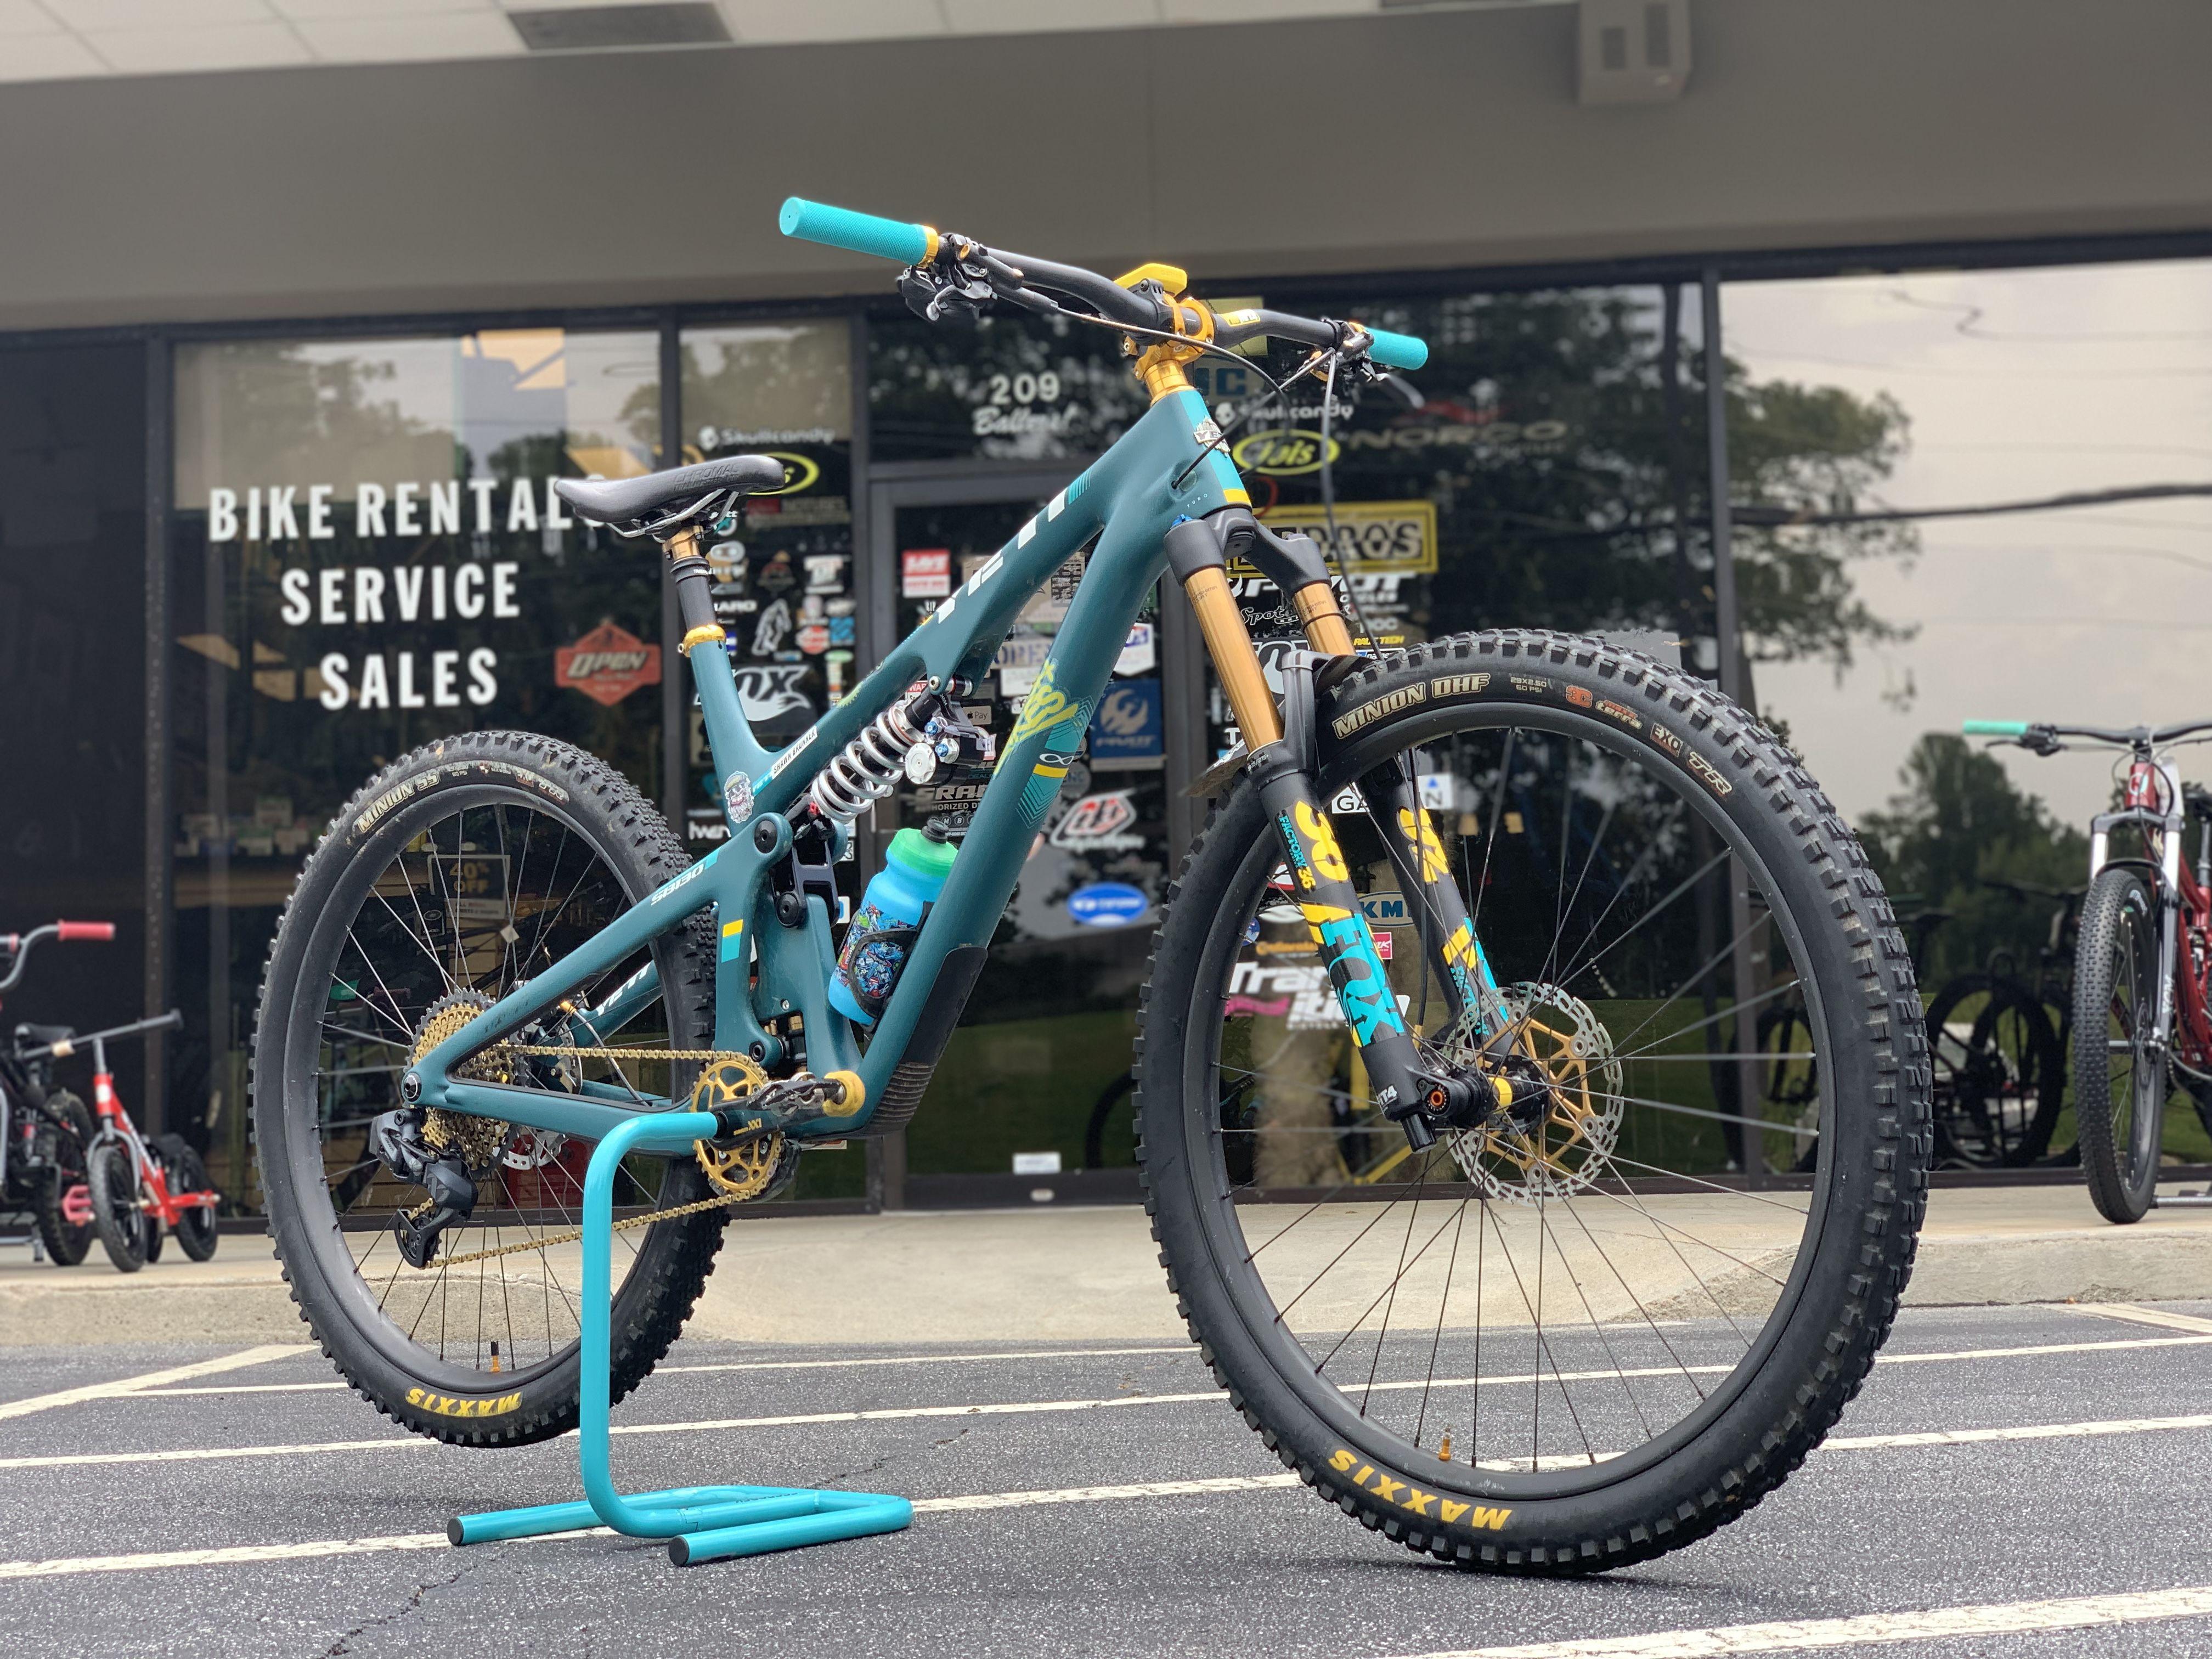 Pin By Yeray Mateos On Mtn Bike In 2020 Fox Racing Shox Bike Mtb Bike